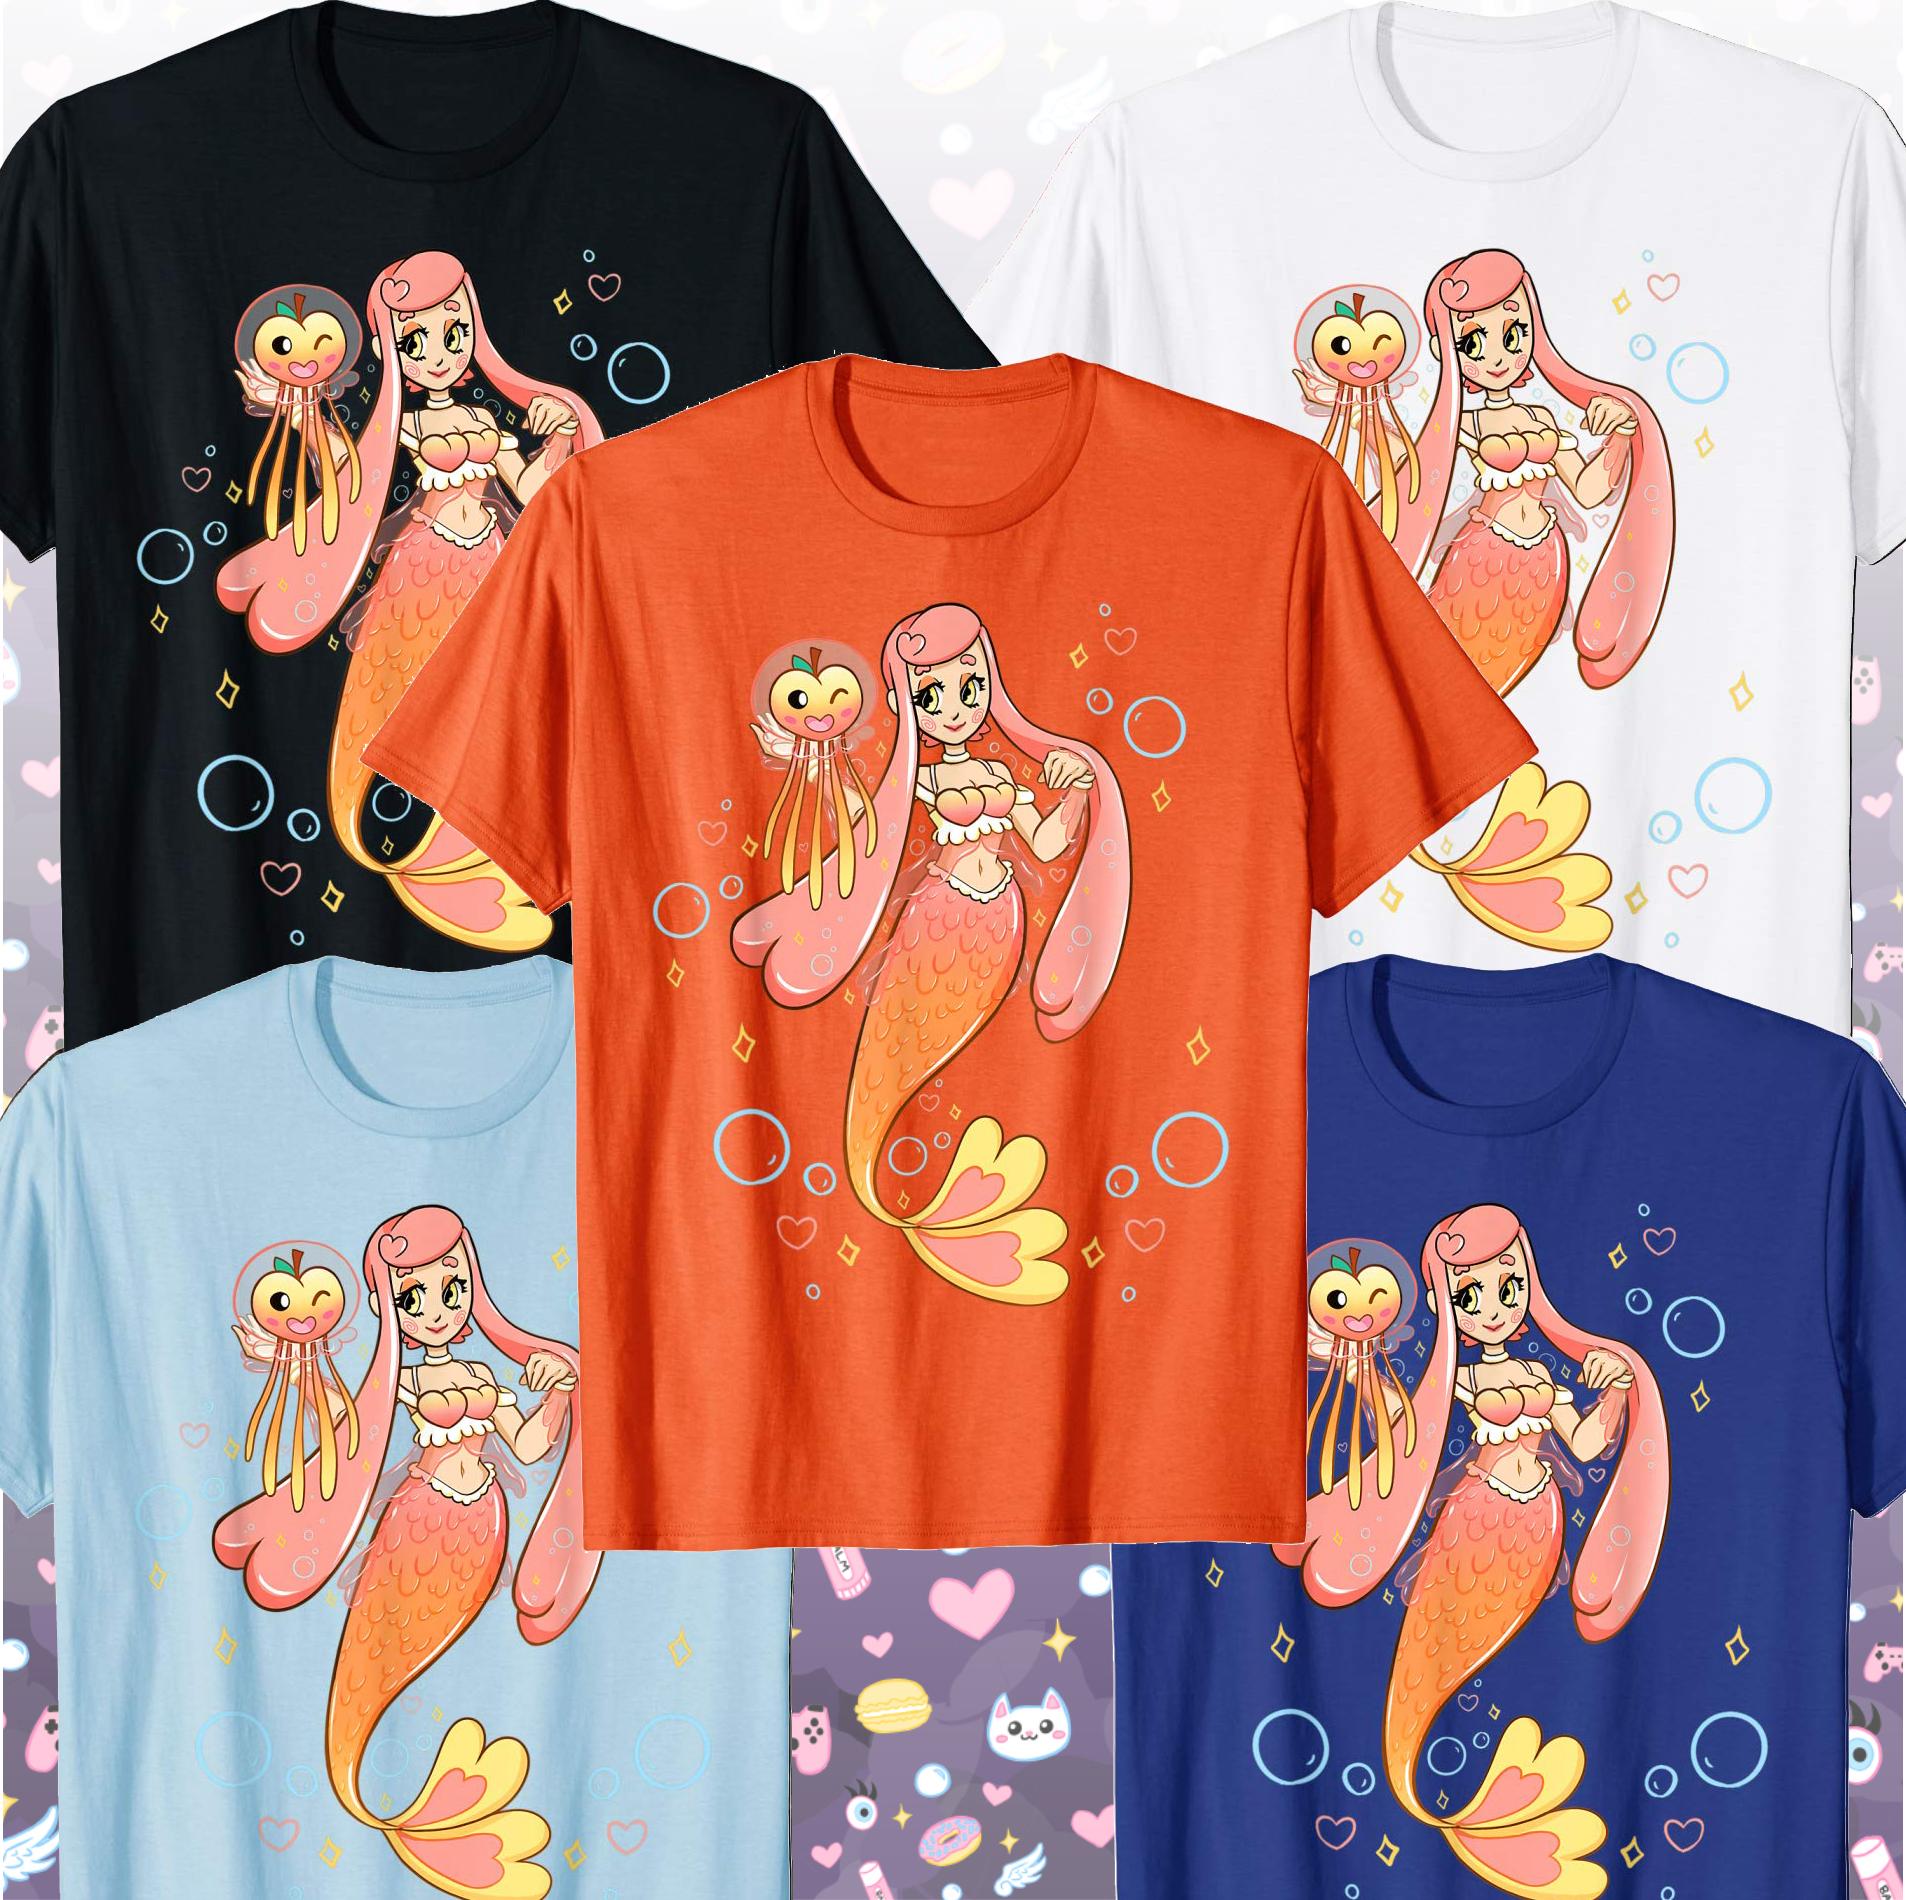 meiyu shirts.jpg